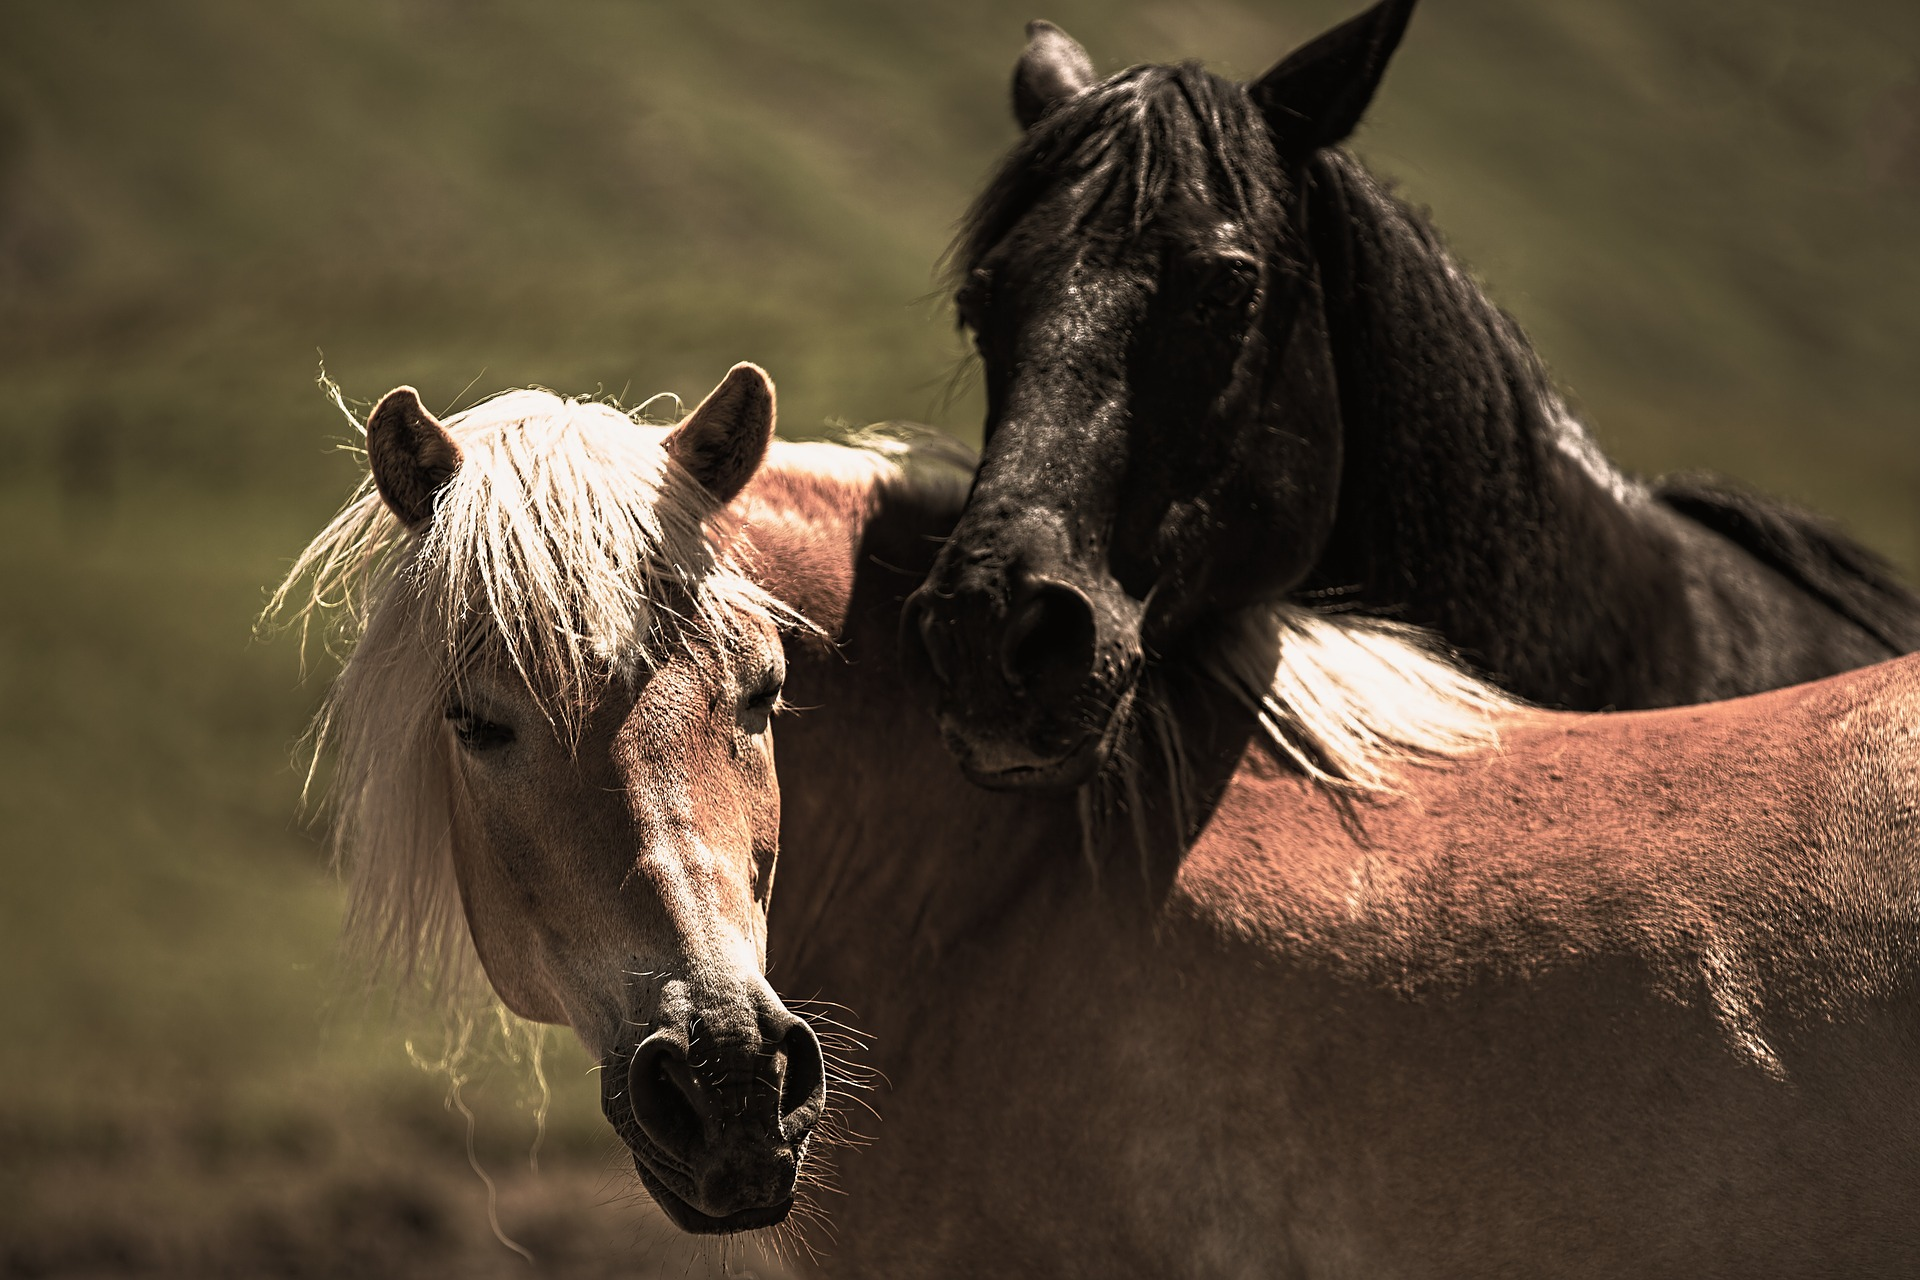 play-horses-853894_1920